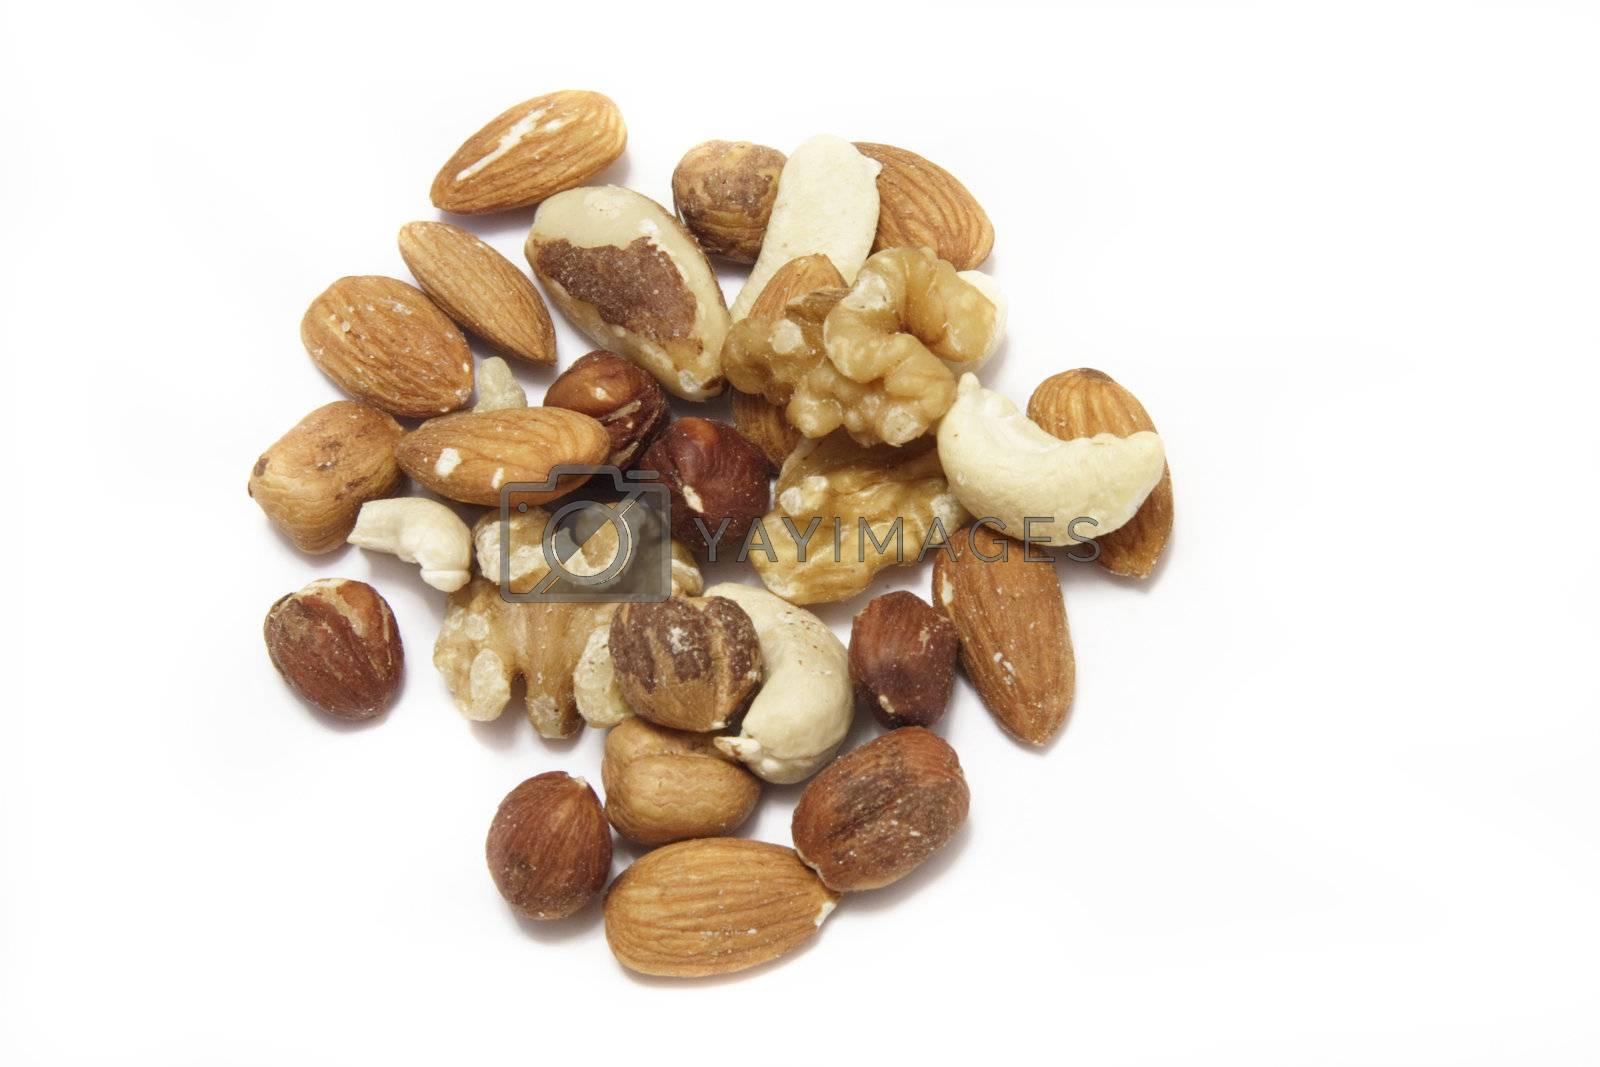 assorted mixed nuts of cashews,almonds,walnuts,hazelnuts,and brazil nuts